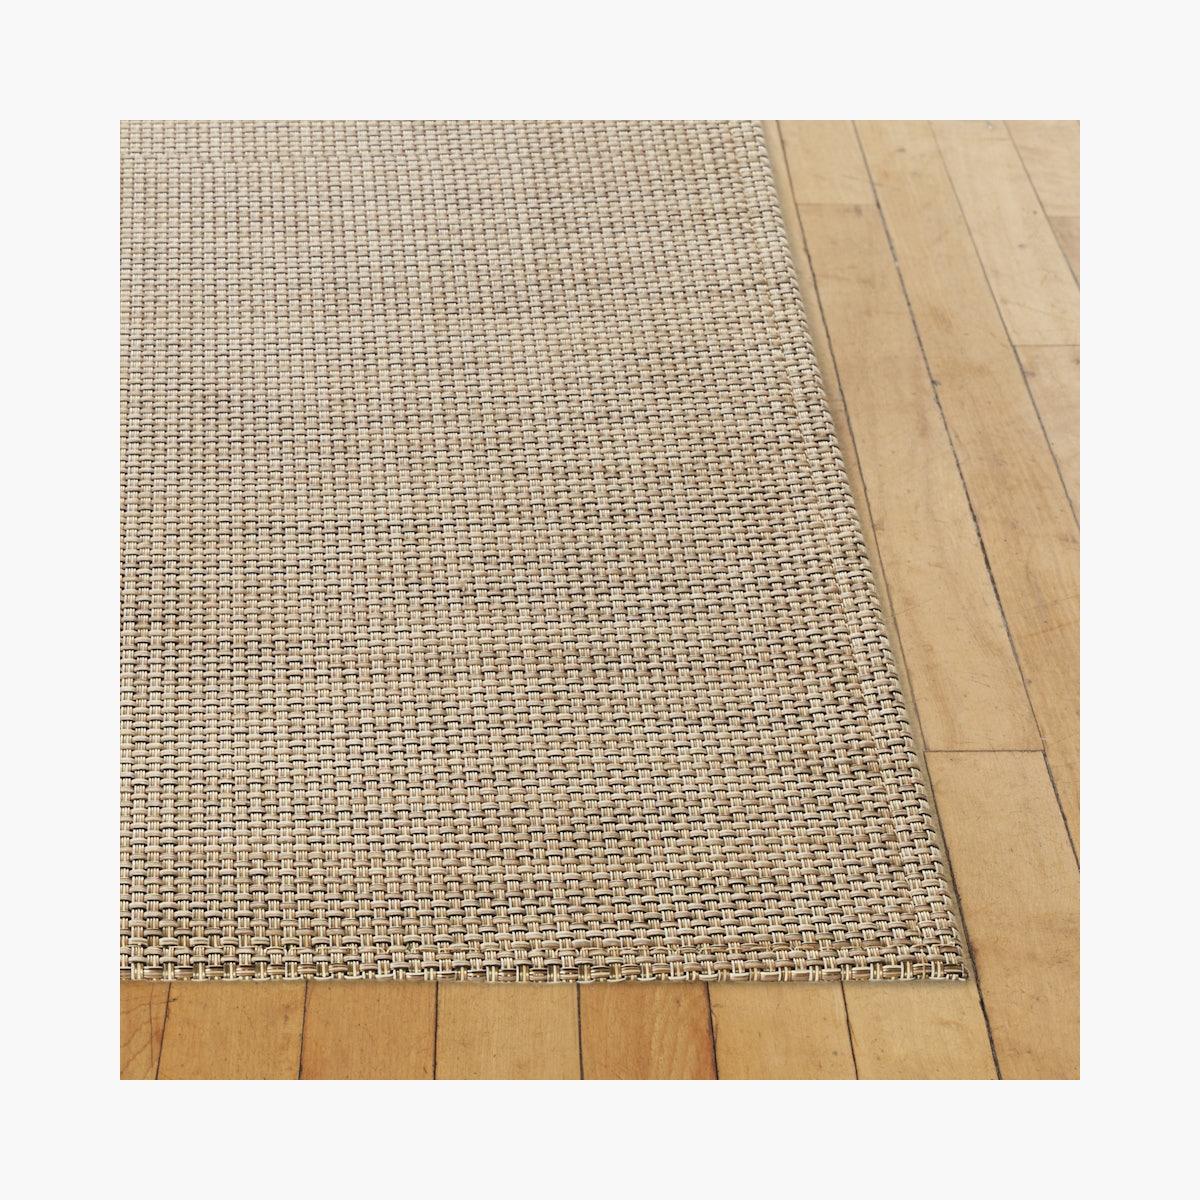 Chilewich Basketweave Floor Runner